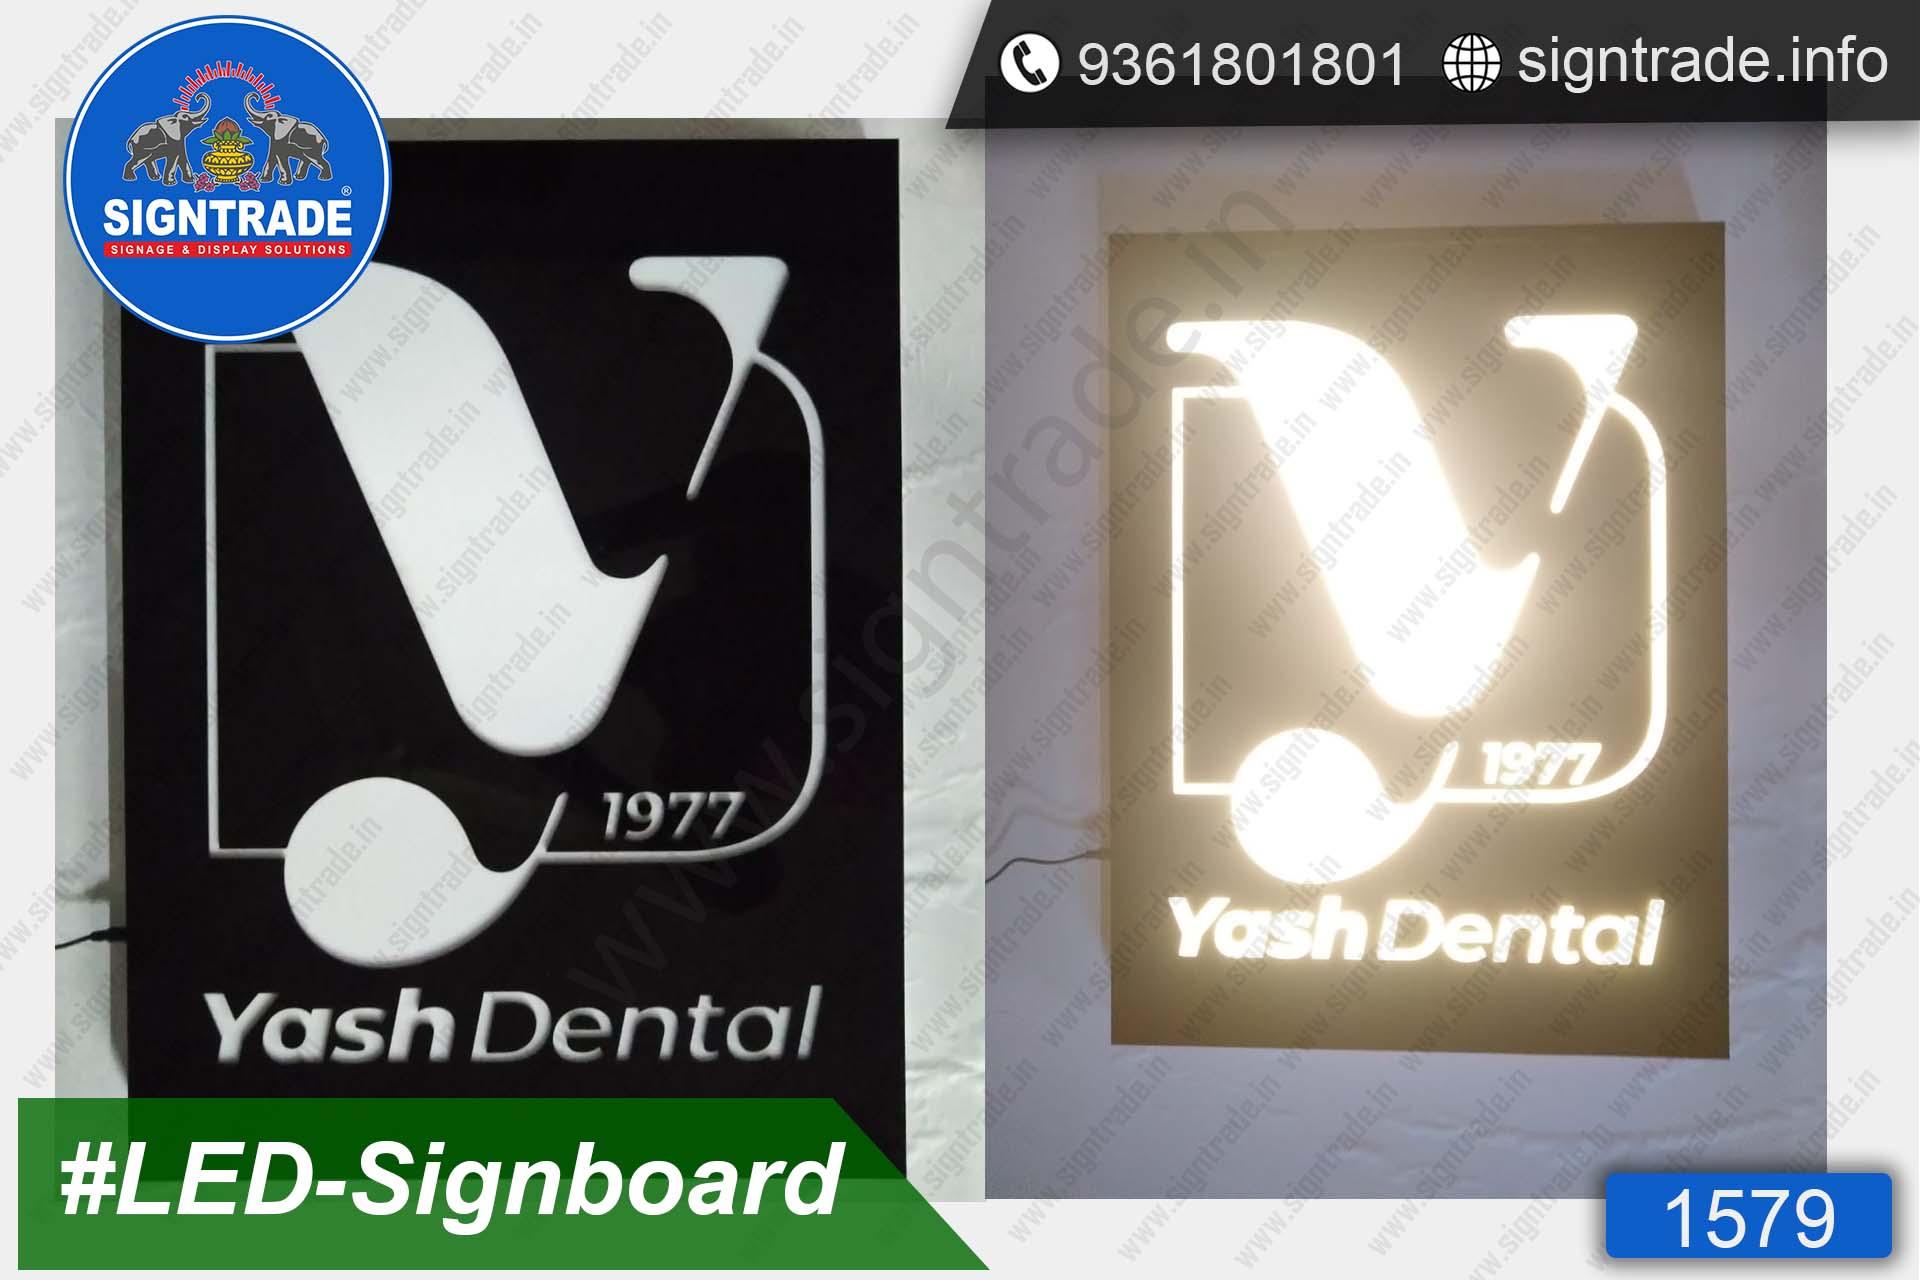 Yash Dental, Chennai - SIGNTRADE - Acrylic, LED Sign Board Manufacturers in Chennai